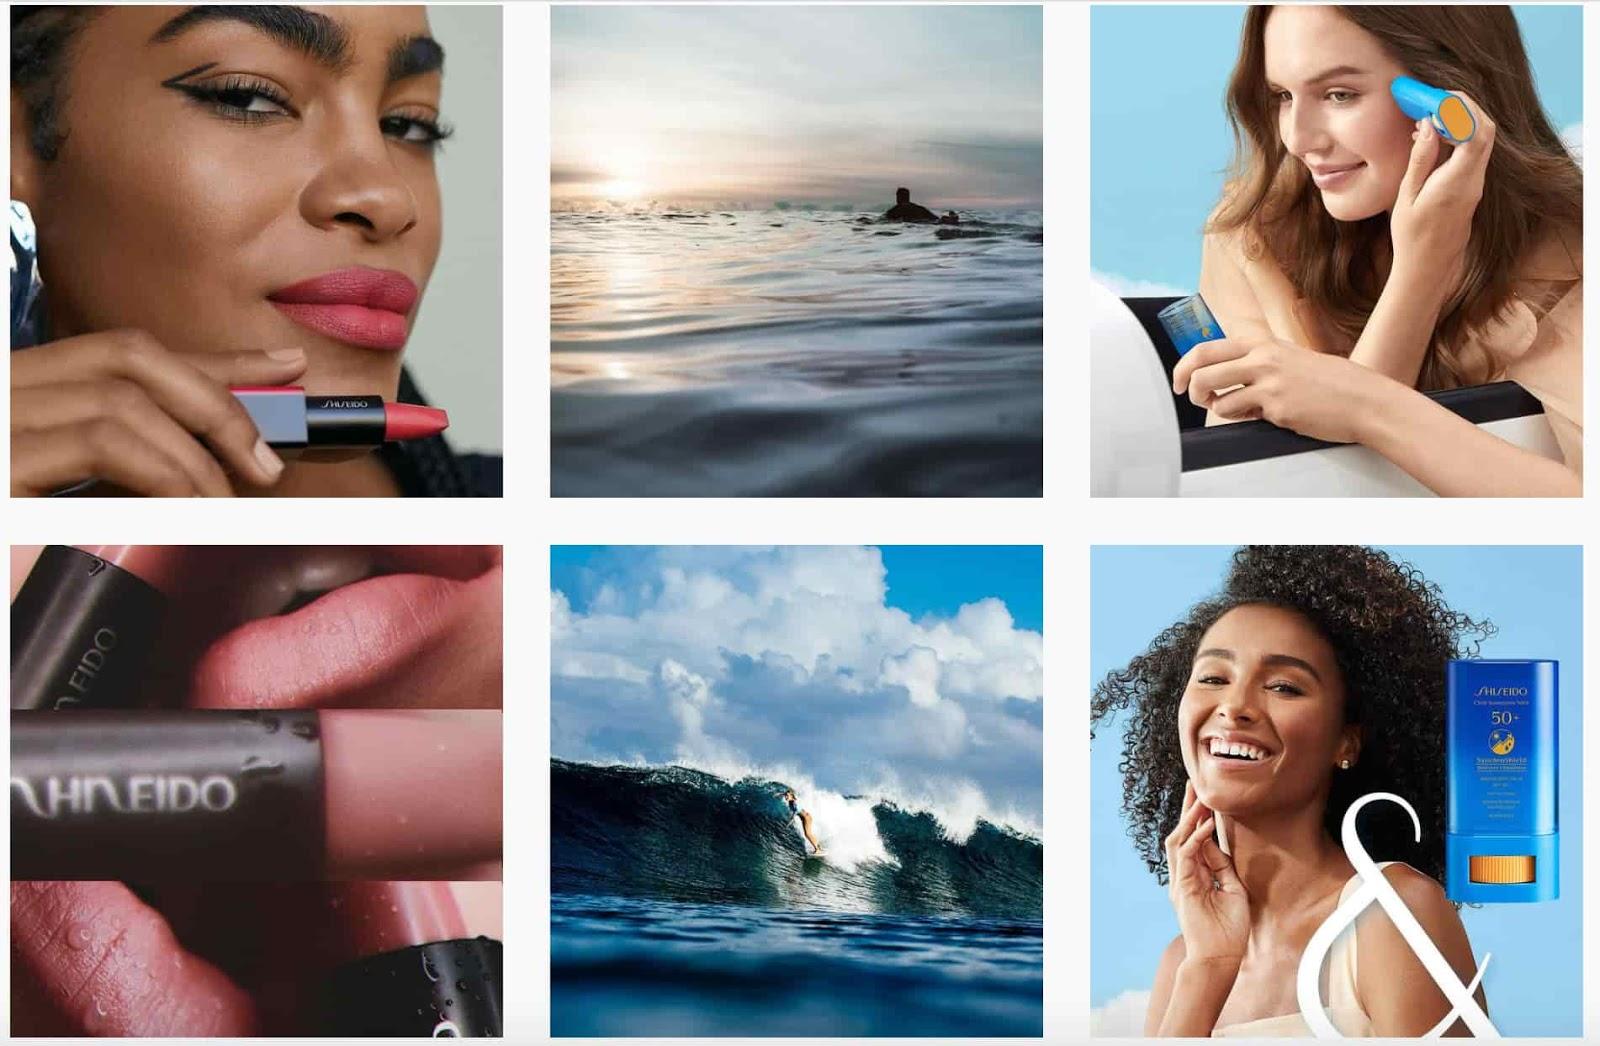 Shiseido instagra, brand